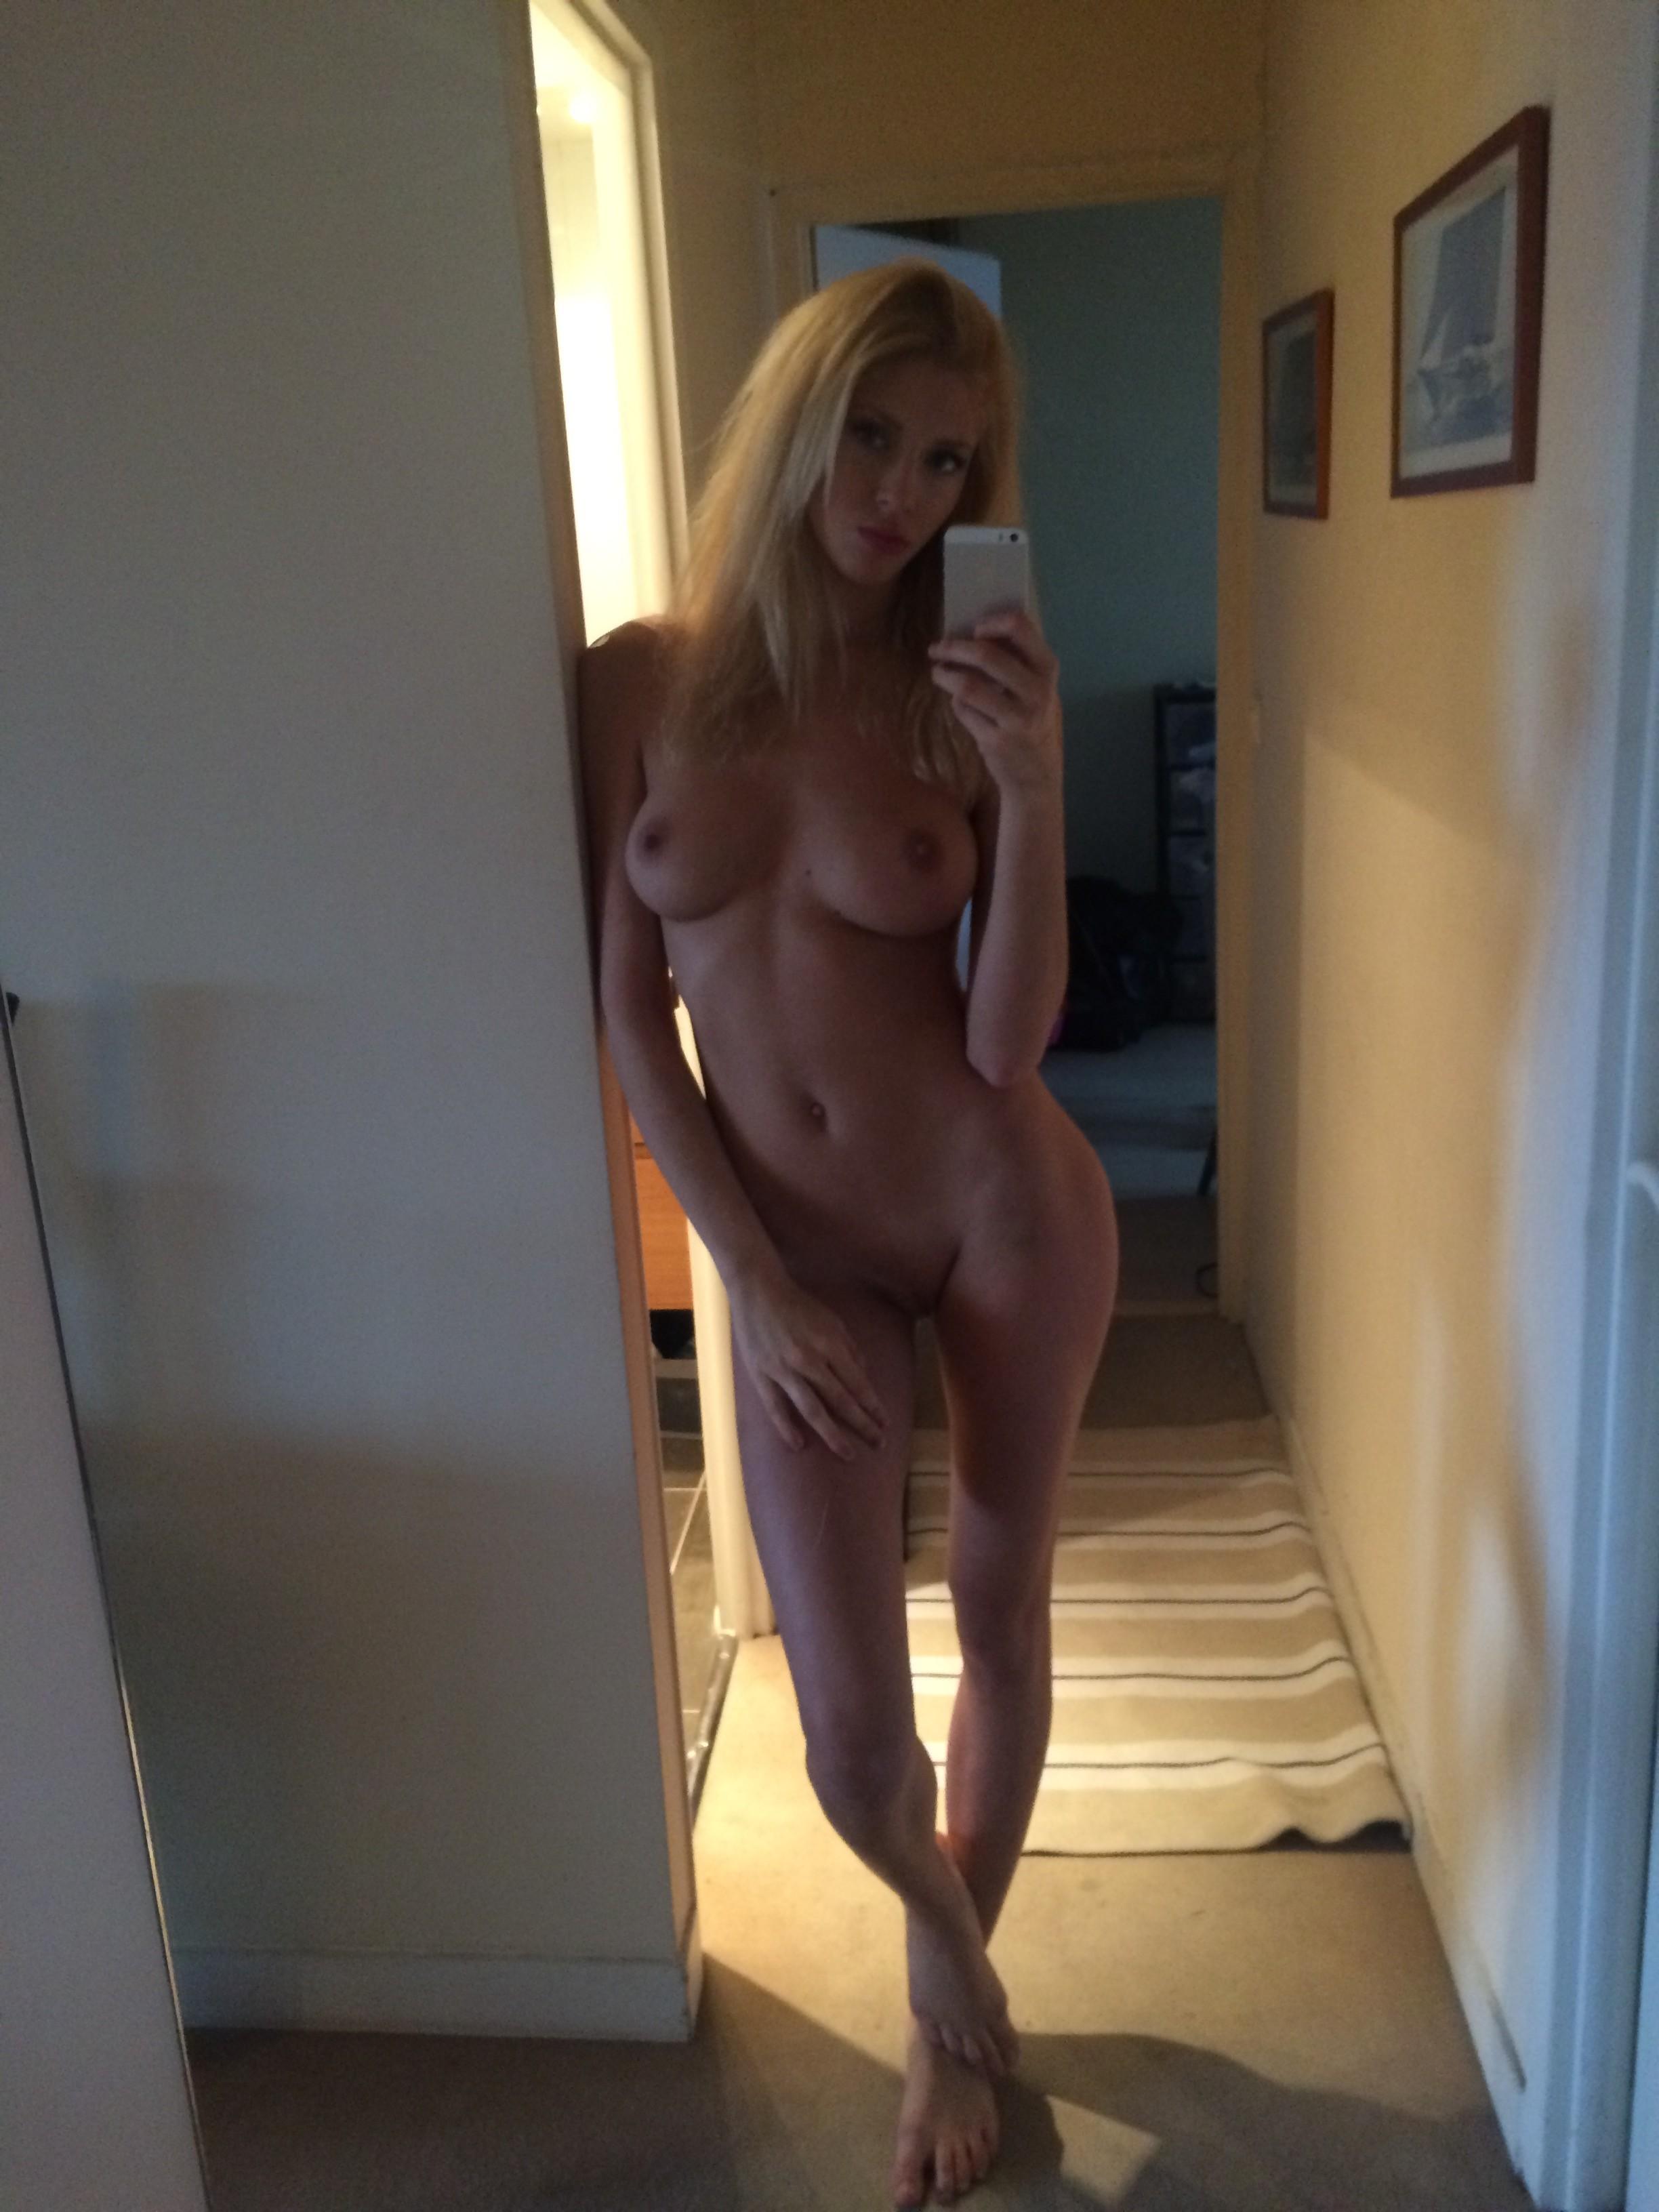 selfie-naked-girls-selfshot-amateur-mix-vol5-34